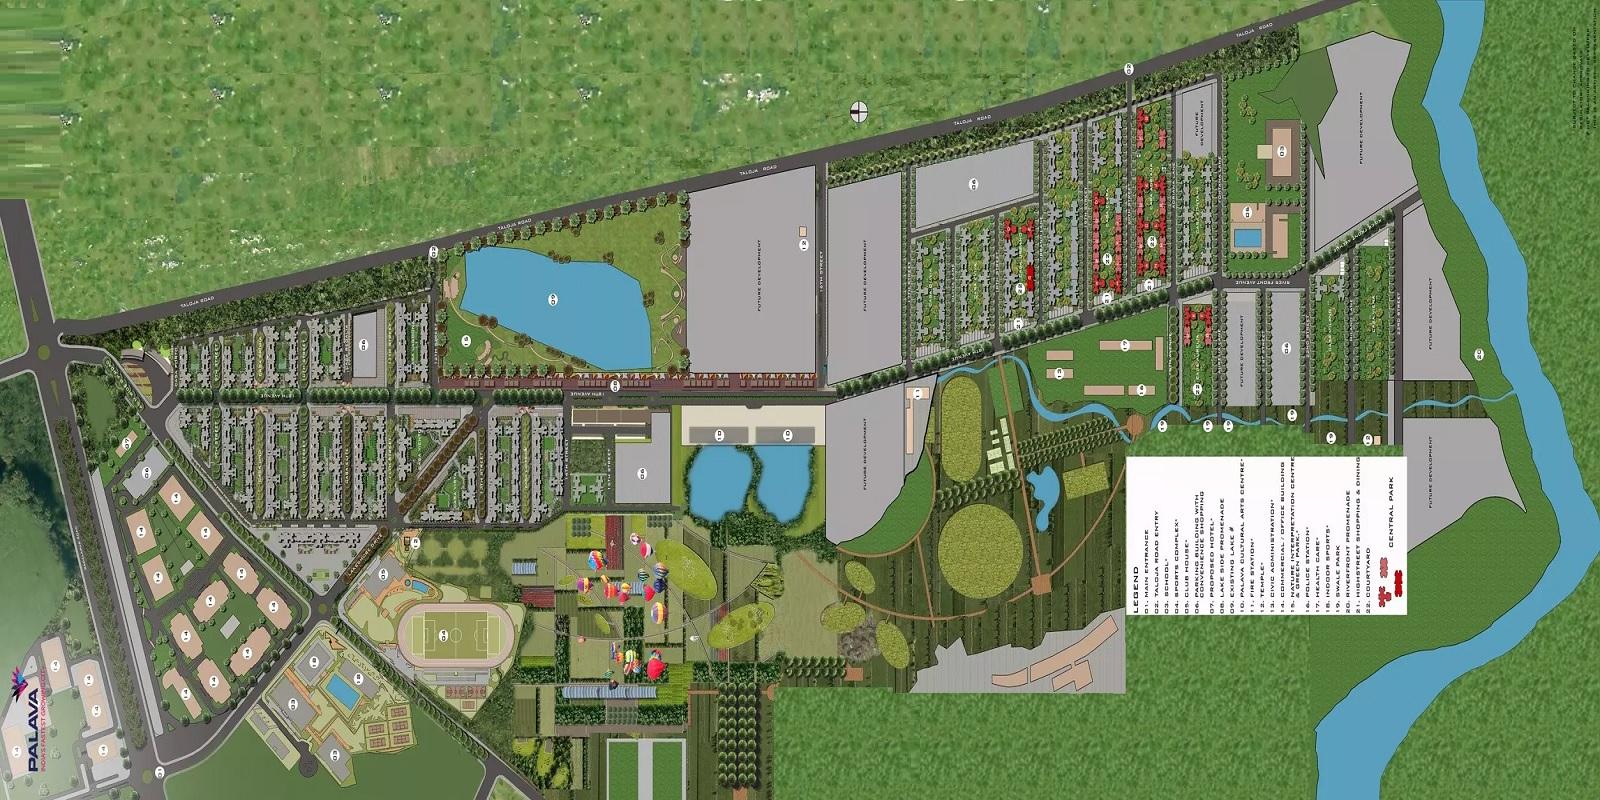 lodha centre park master plan image4